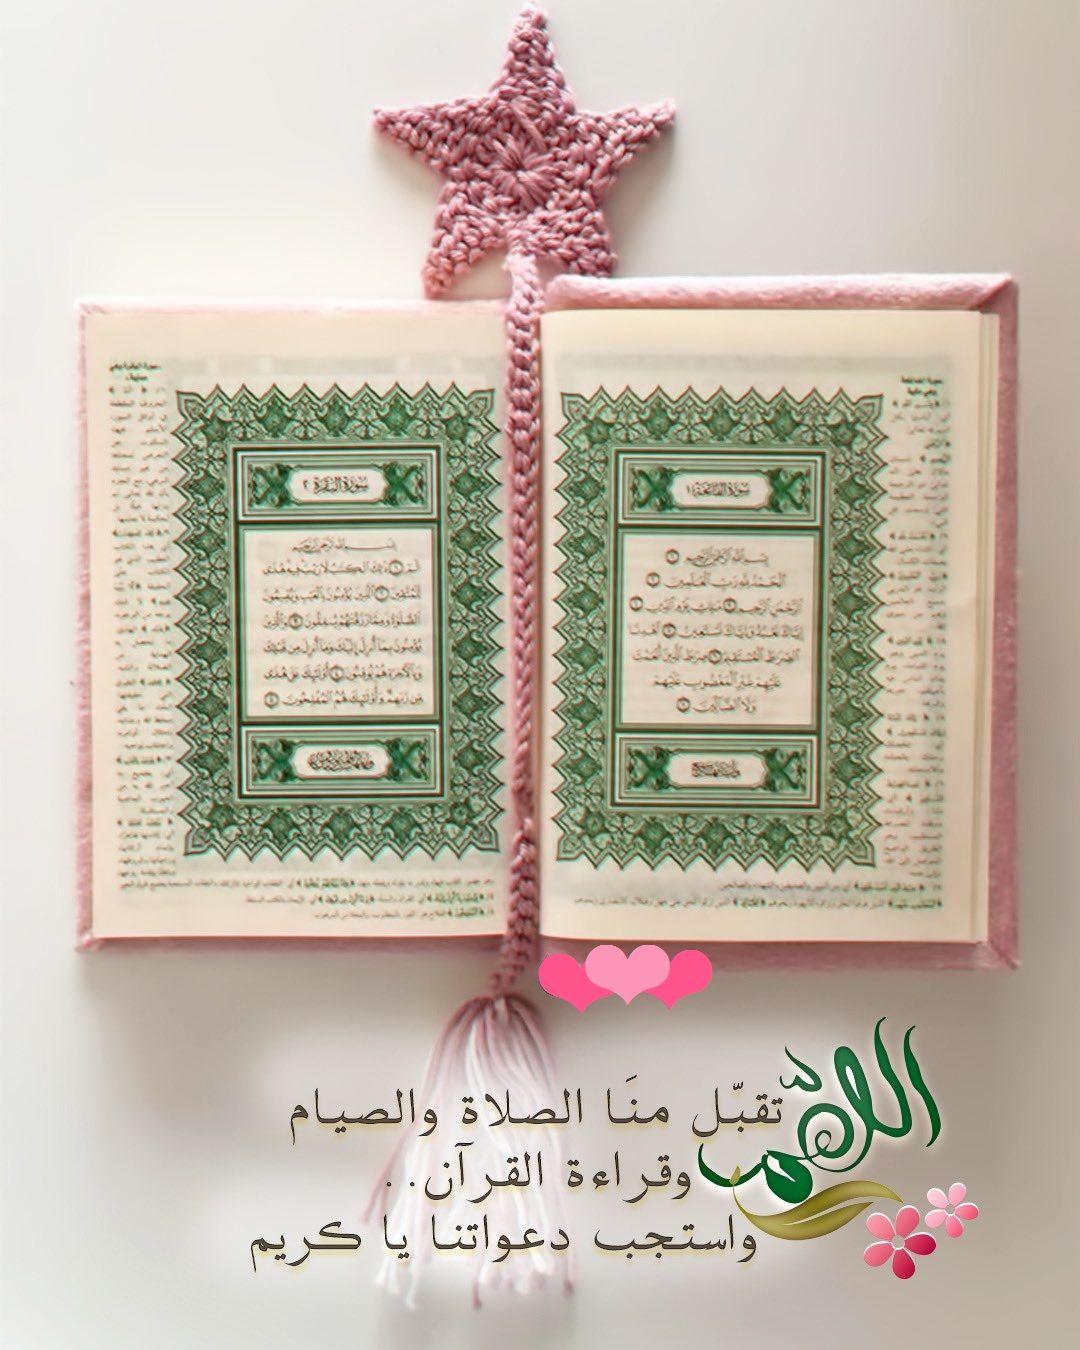 Pin By Ayat Murad On Ramadanشهر الرحمة Box Packaging Design Frame Ramadan